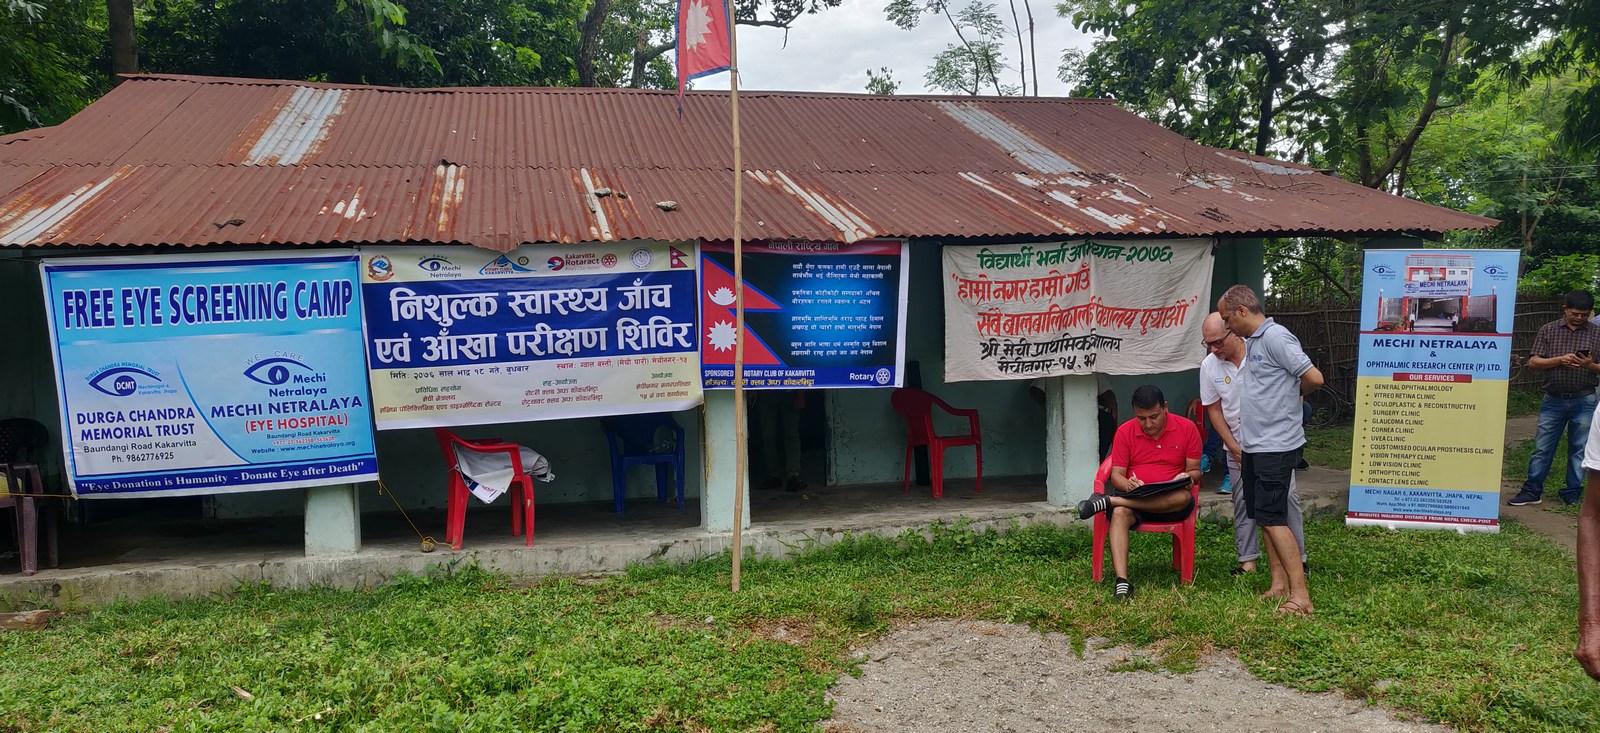 Free-Health-Camp-Eye-Screening-at-Gwala-Basti-Mechinagar-15-Jhapa-Nepal-Rotary-Club-of-Kakarvitta-9